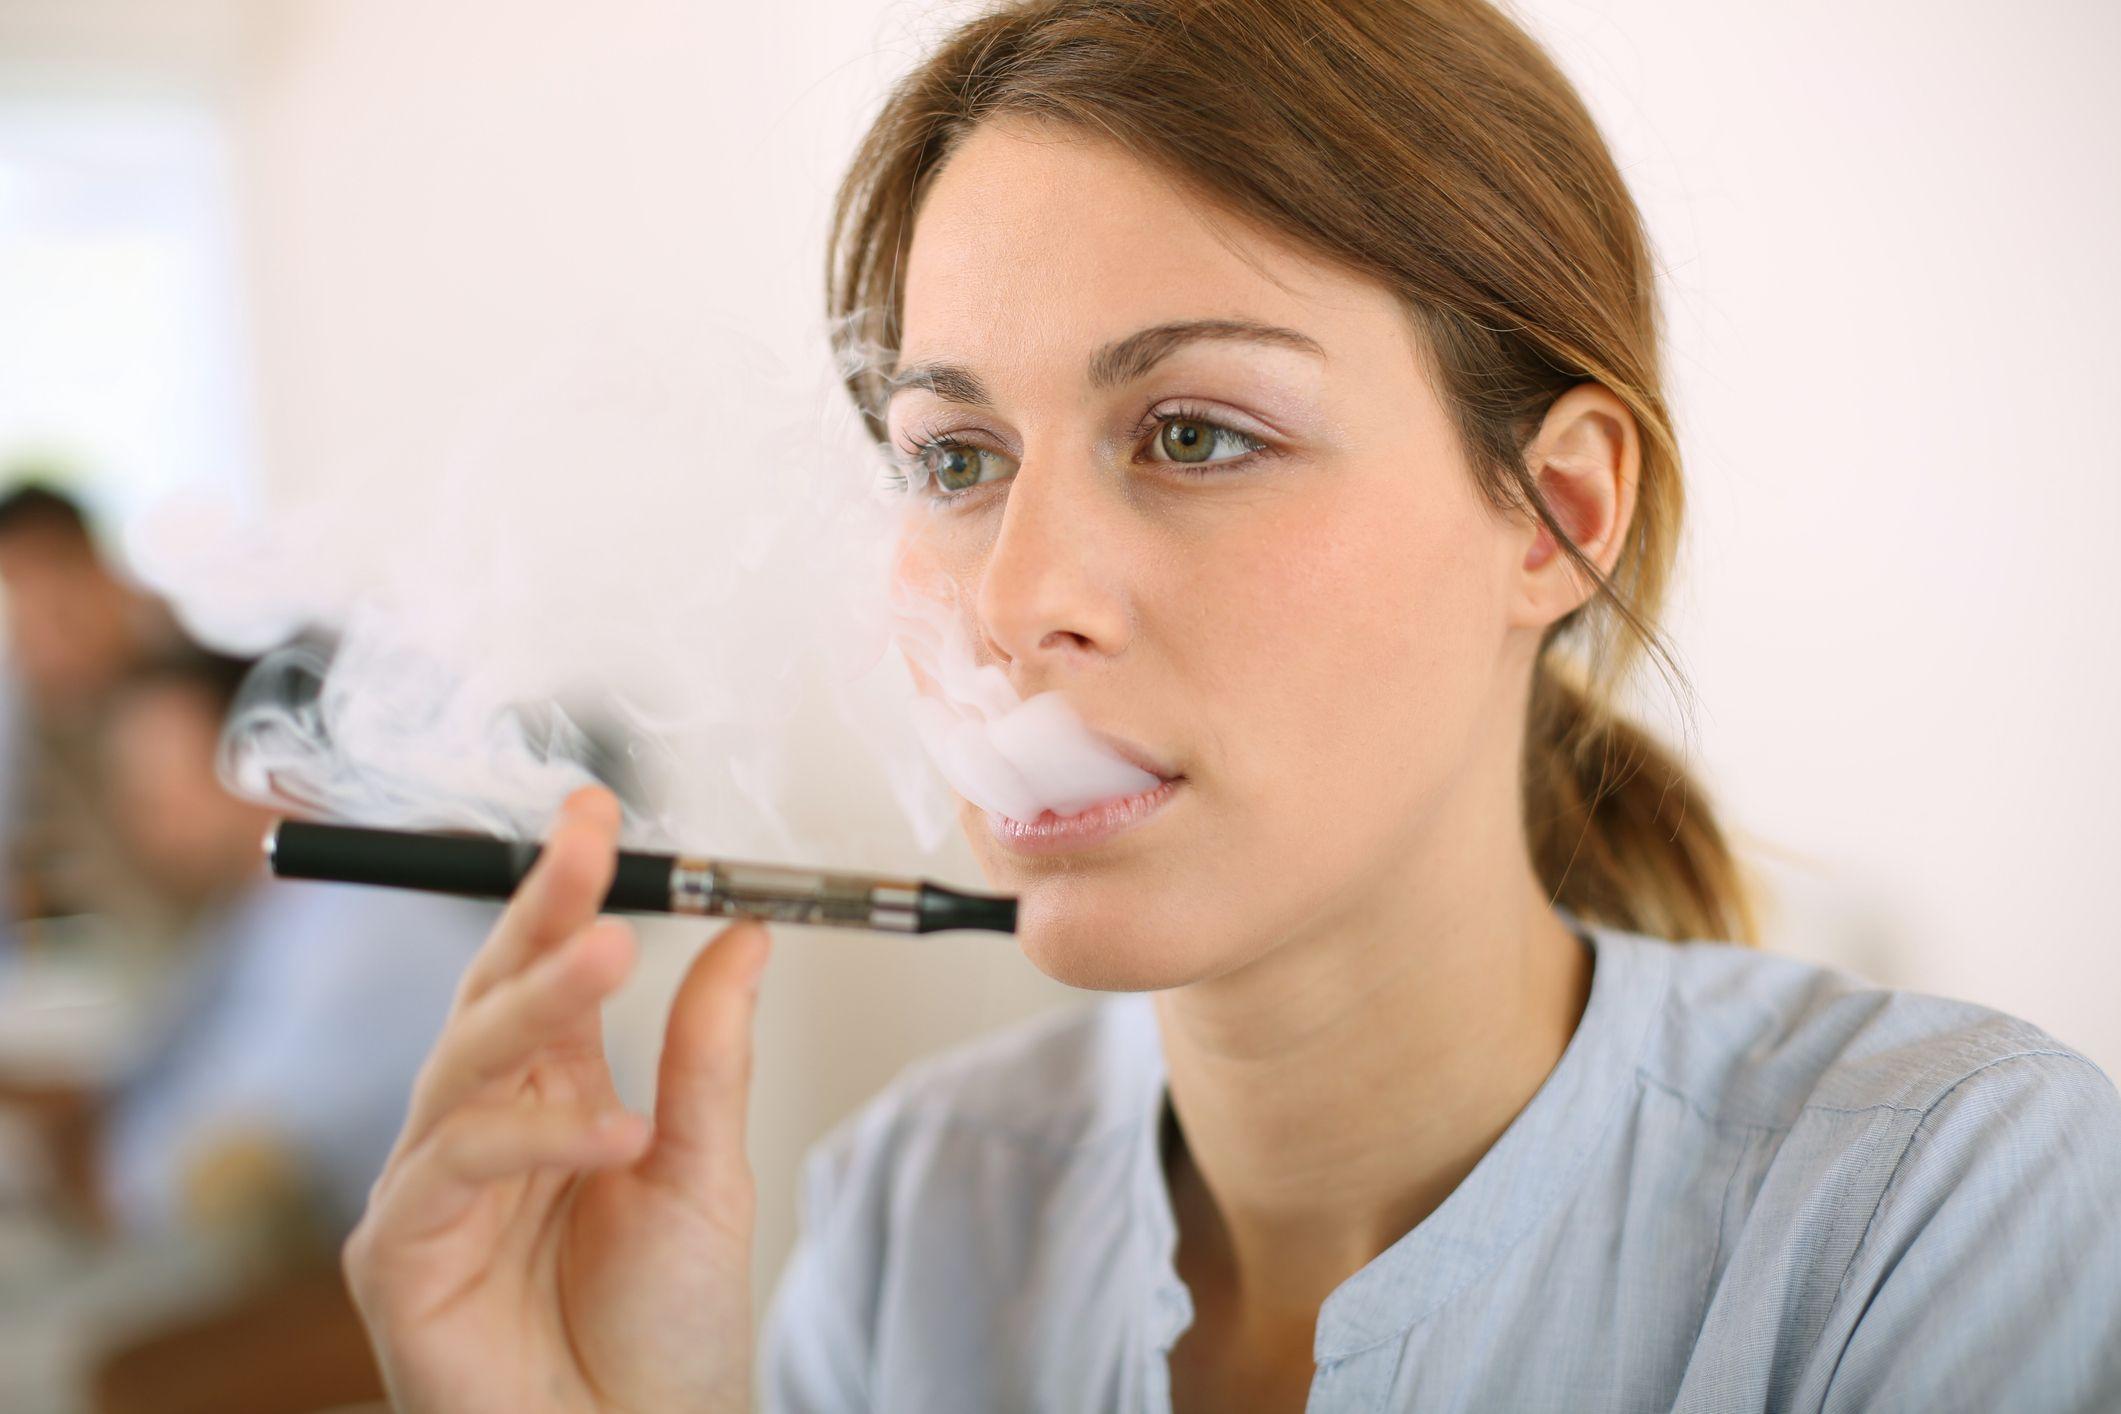 e-cigarette vape vaping stock